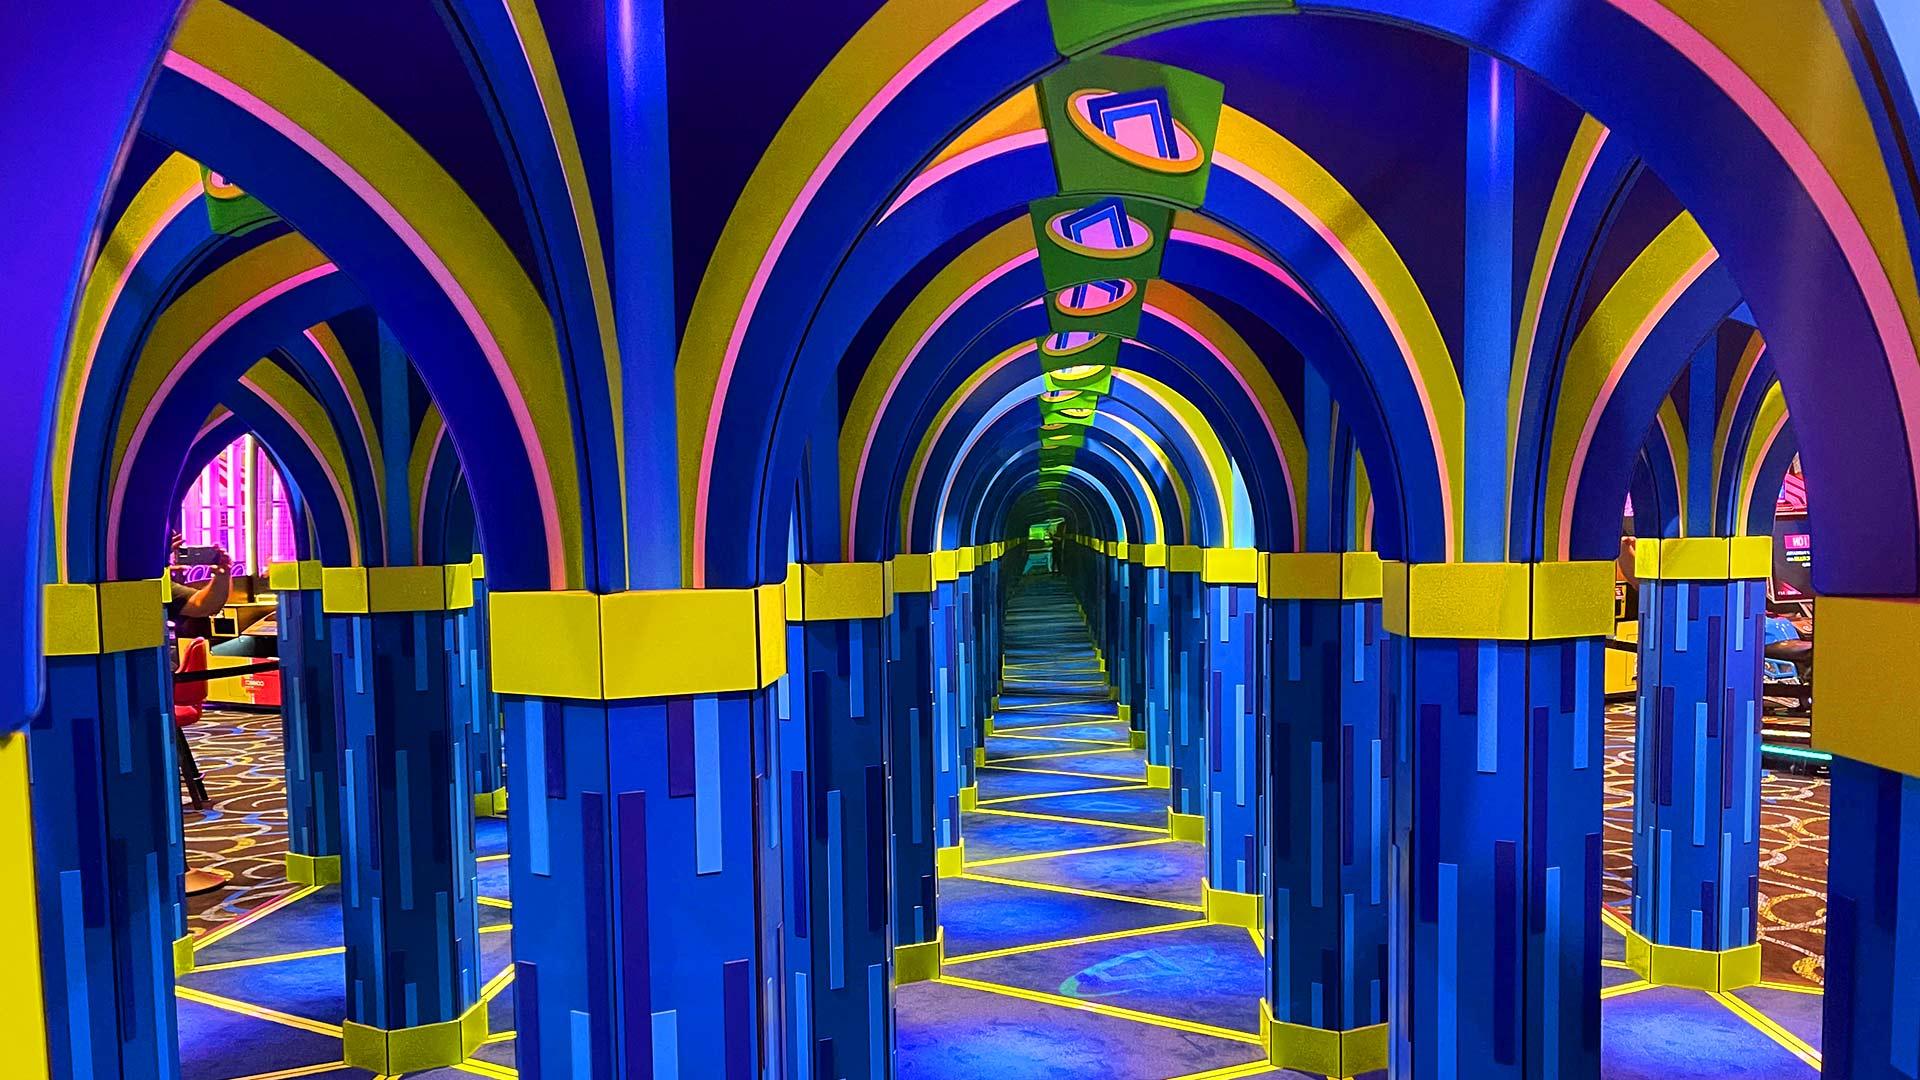 In The Game ICON Park in Orlando has a Mirror Maze